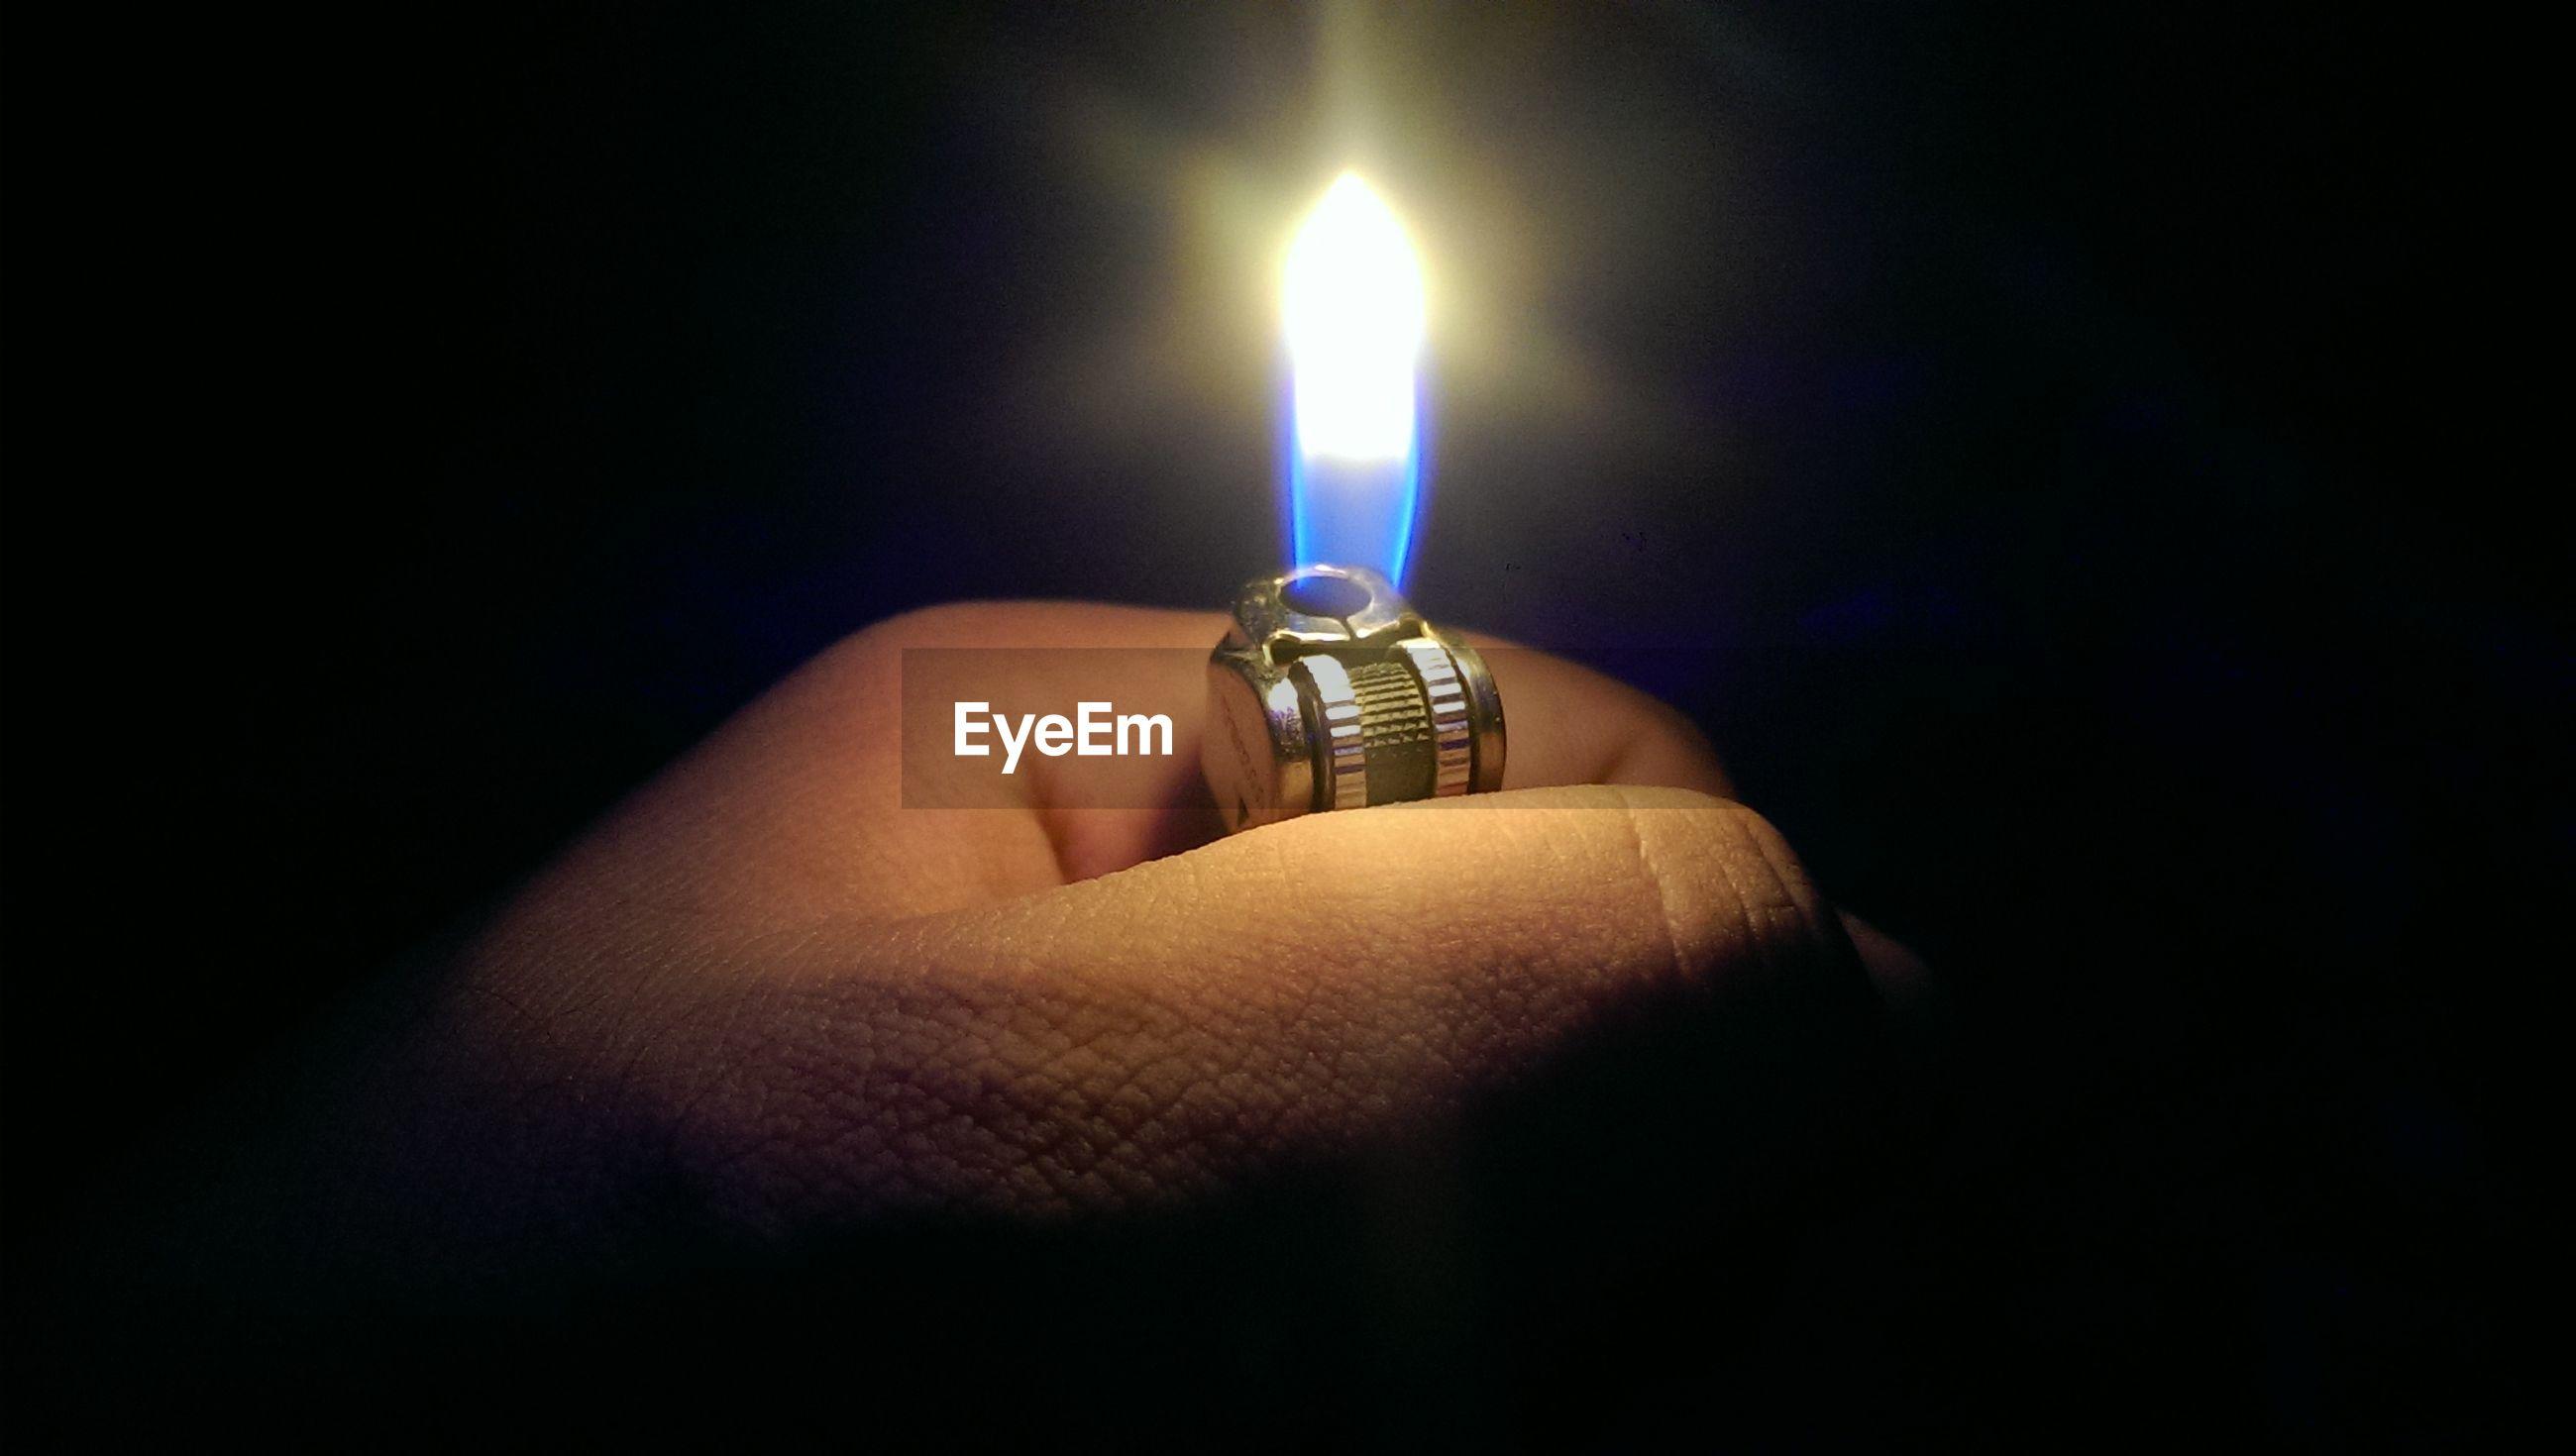 indoors, person, burning, candle, black background, studio shot, flame, illuminated, lit, heat - temperature, glowing, close-up, fire - natural phenomenon, darkroom, part of, dark, lighting equipment